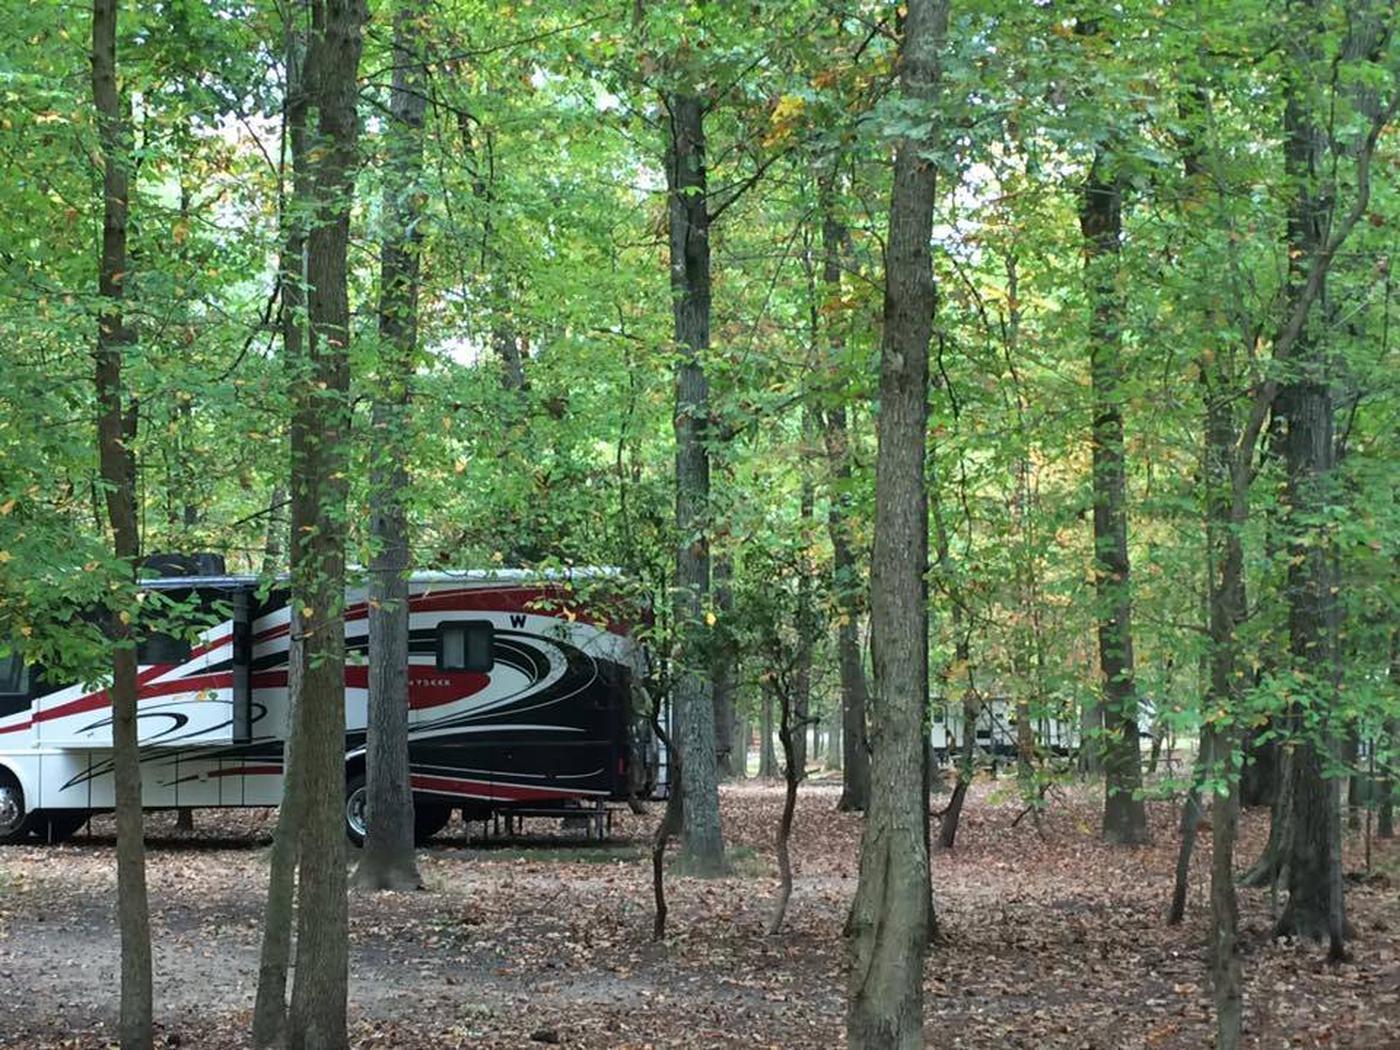 RV in the Greenbelt Park campground